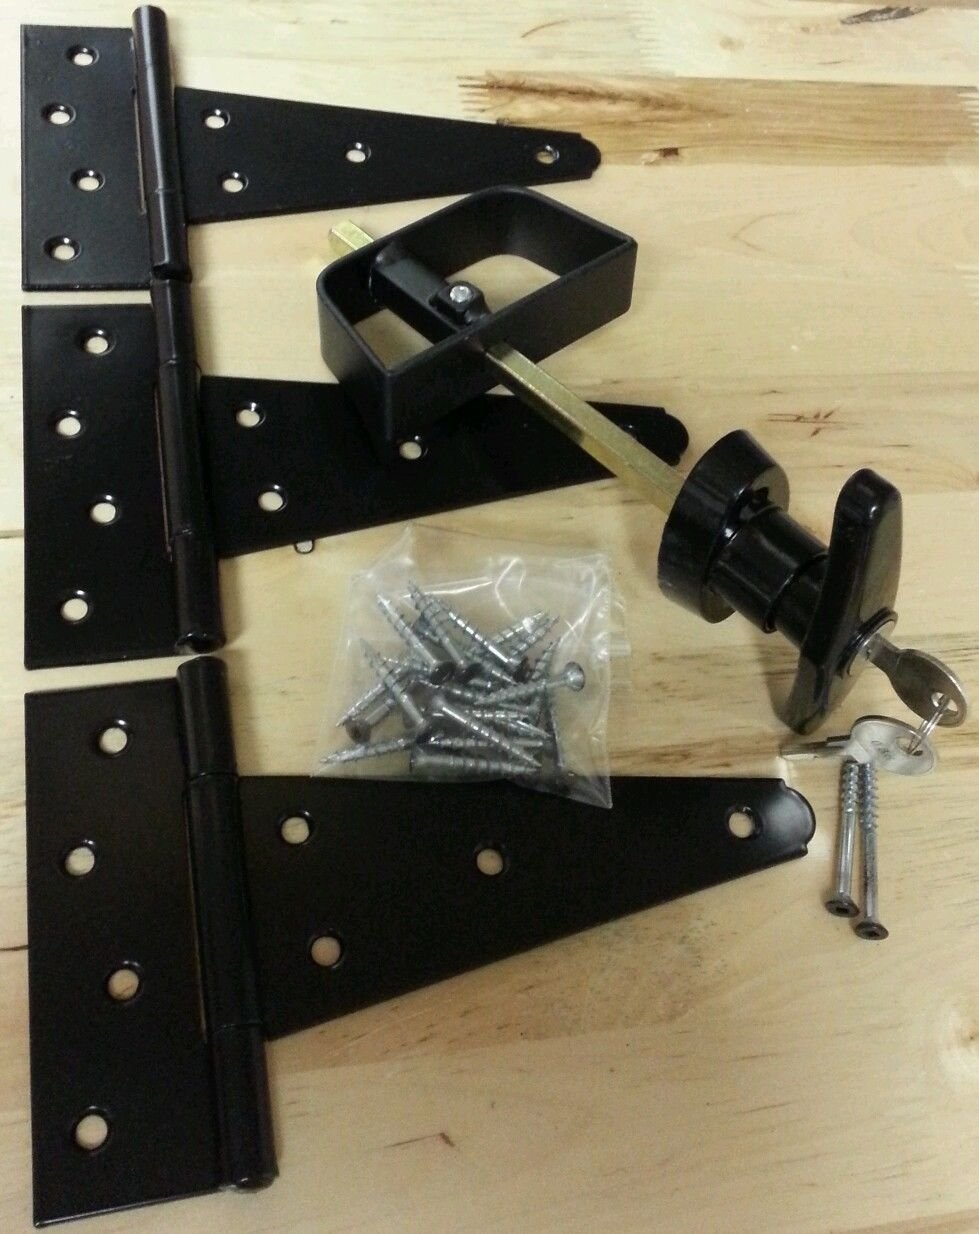 (GARRAG) Black Door Hardware Kit -T handle lock, 6'' T hinges, Screws (For Shed, Gate, Playhouse)